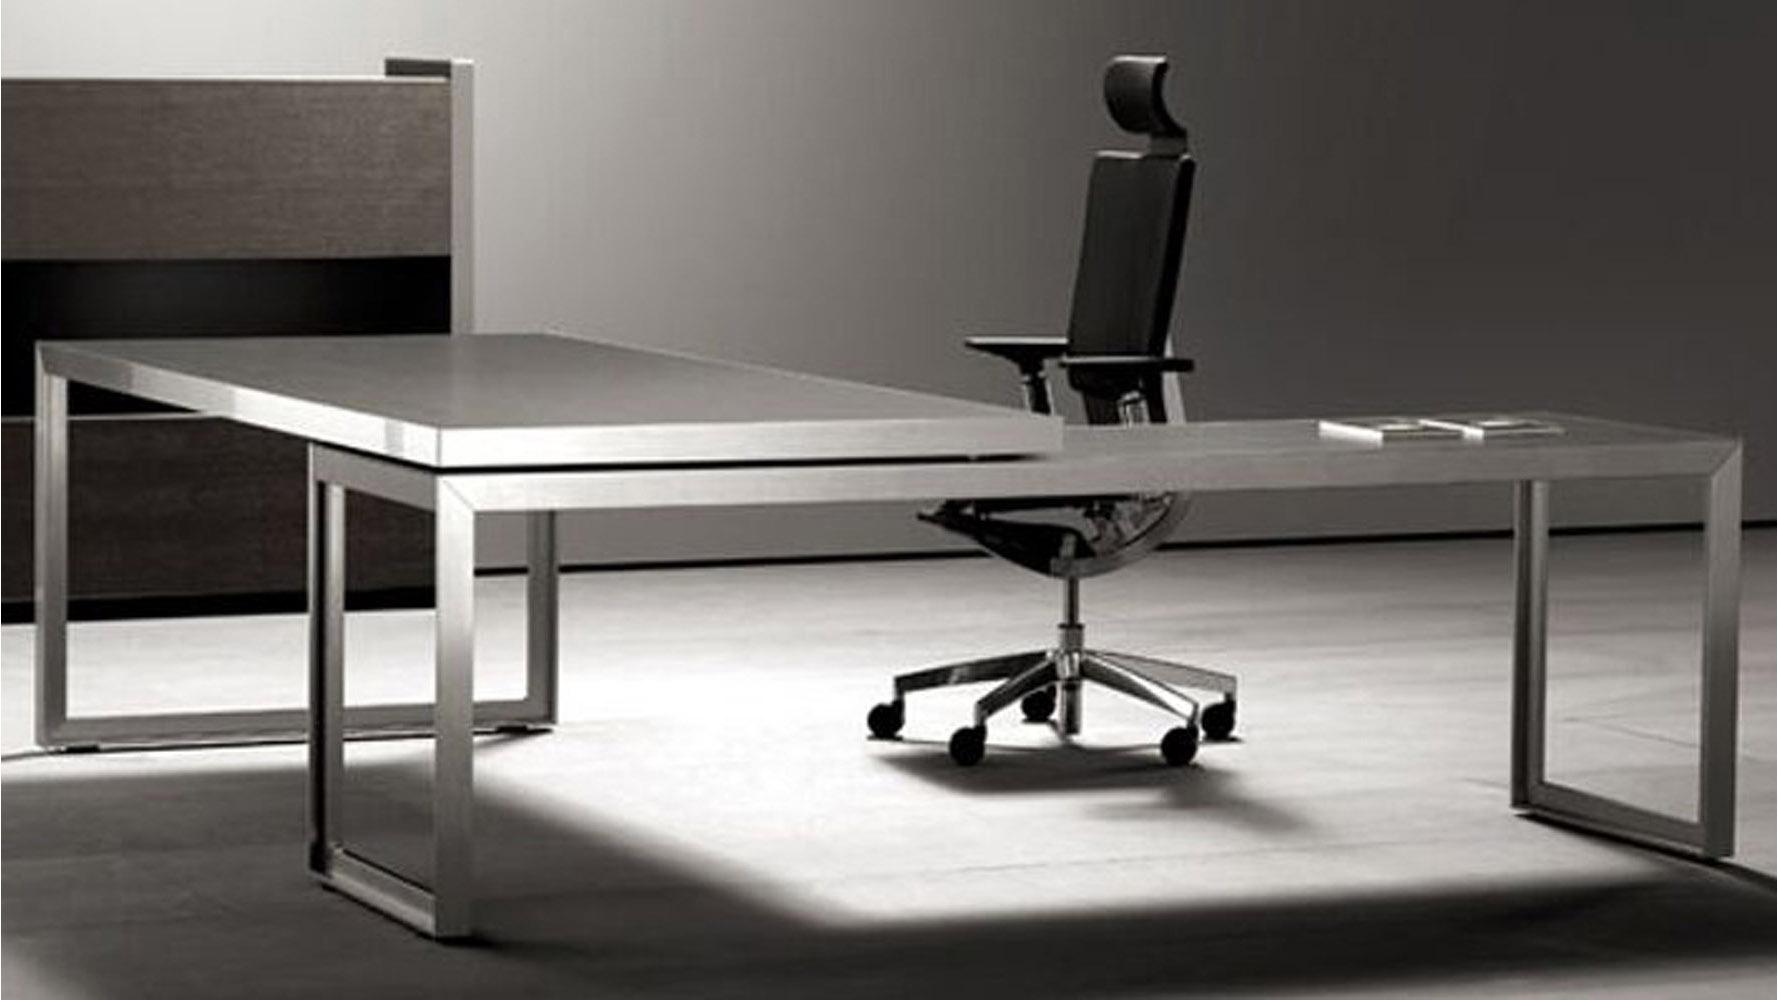 L Shaped Desk. 19 L Shaped Desk Images 7 Most Expensive L